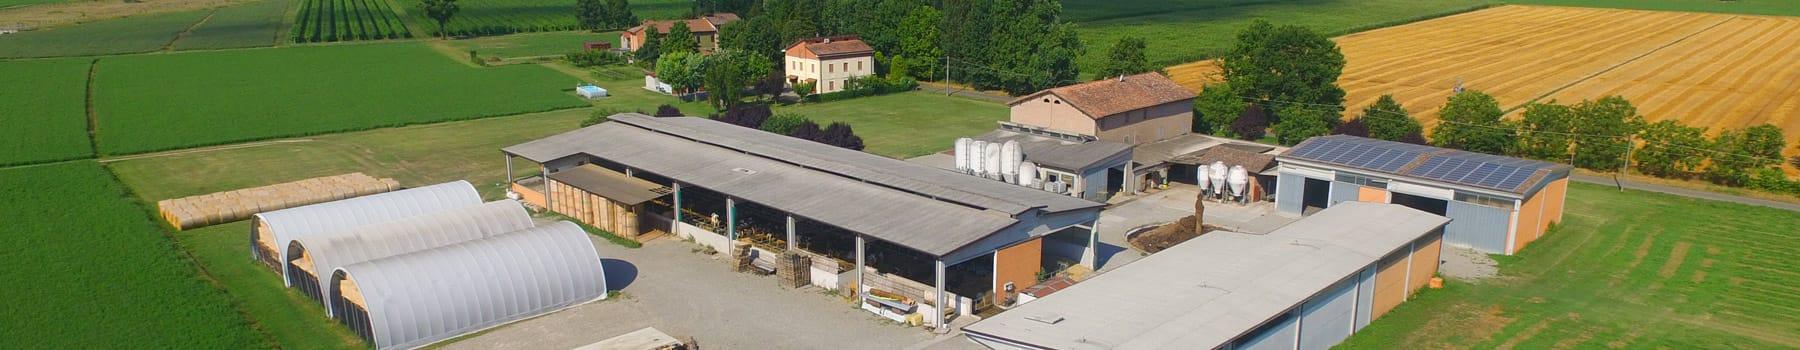 10-le-aziende-agricole